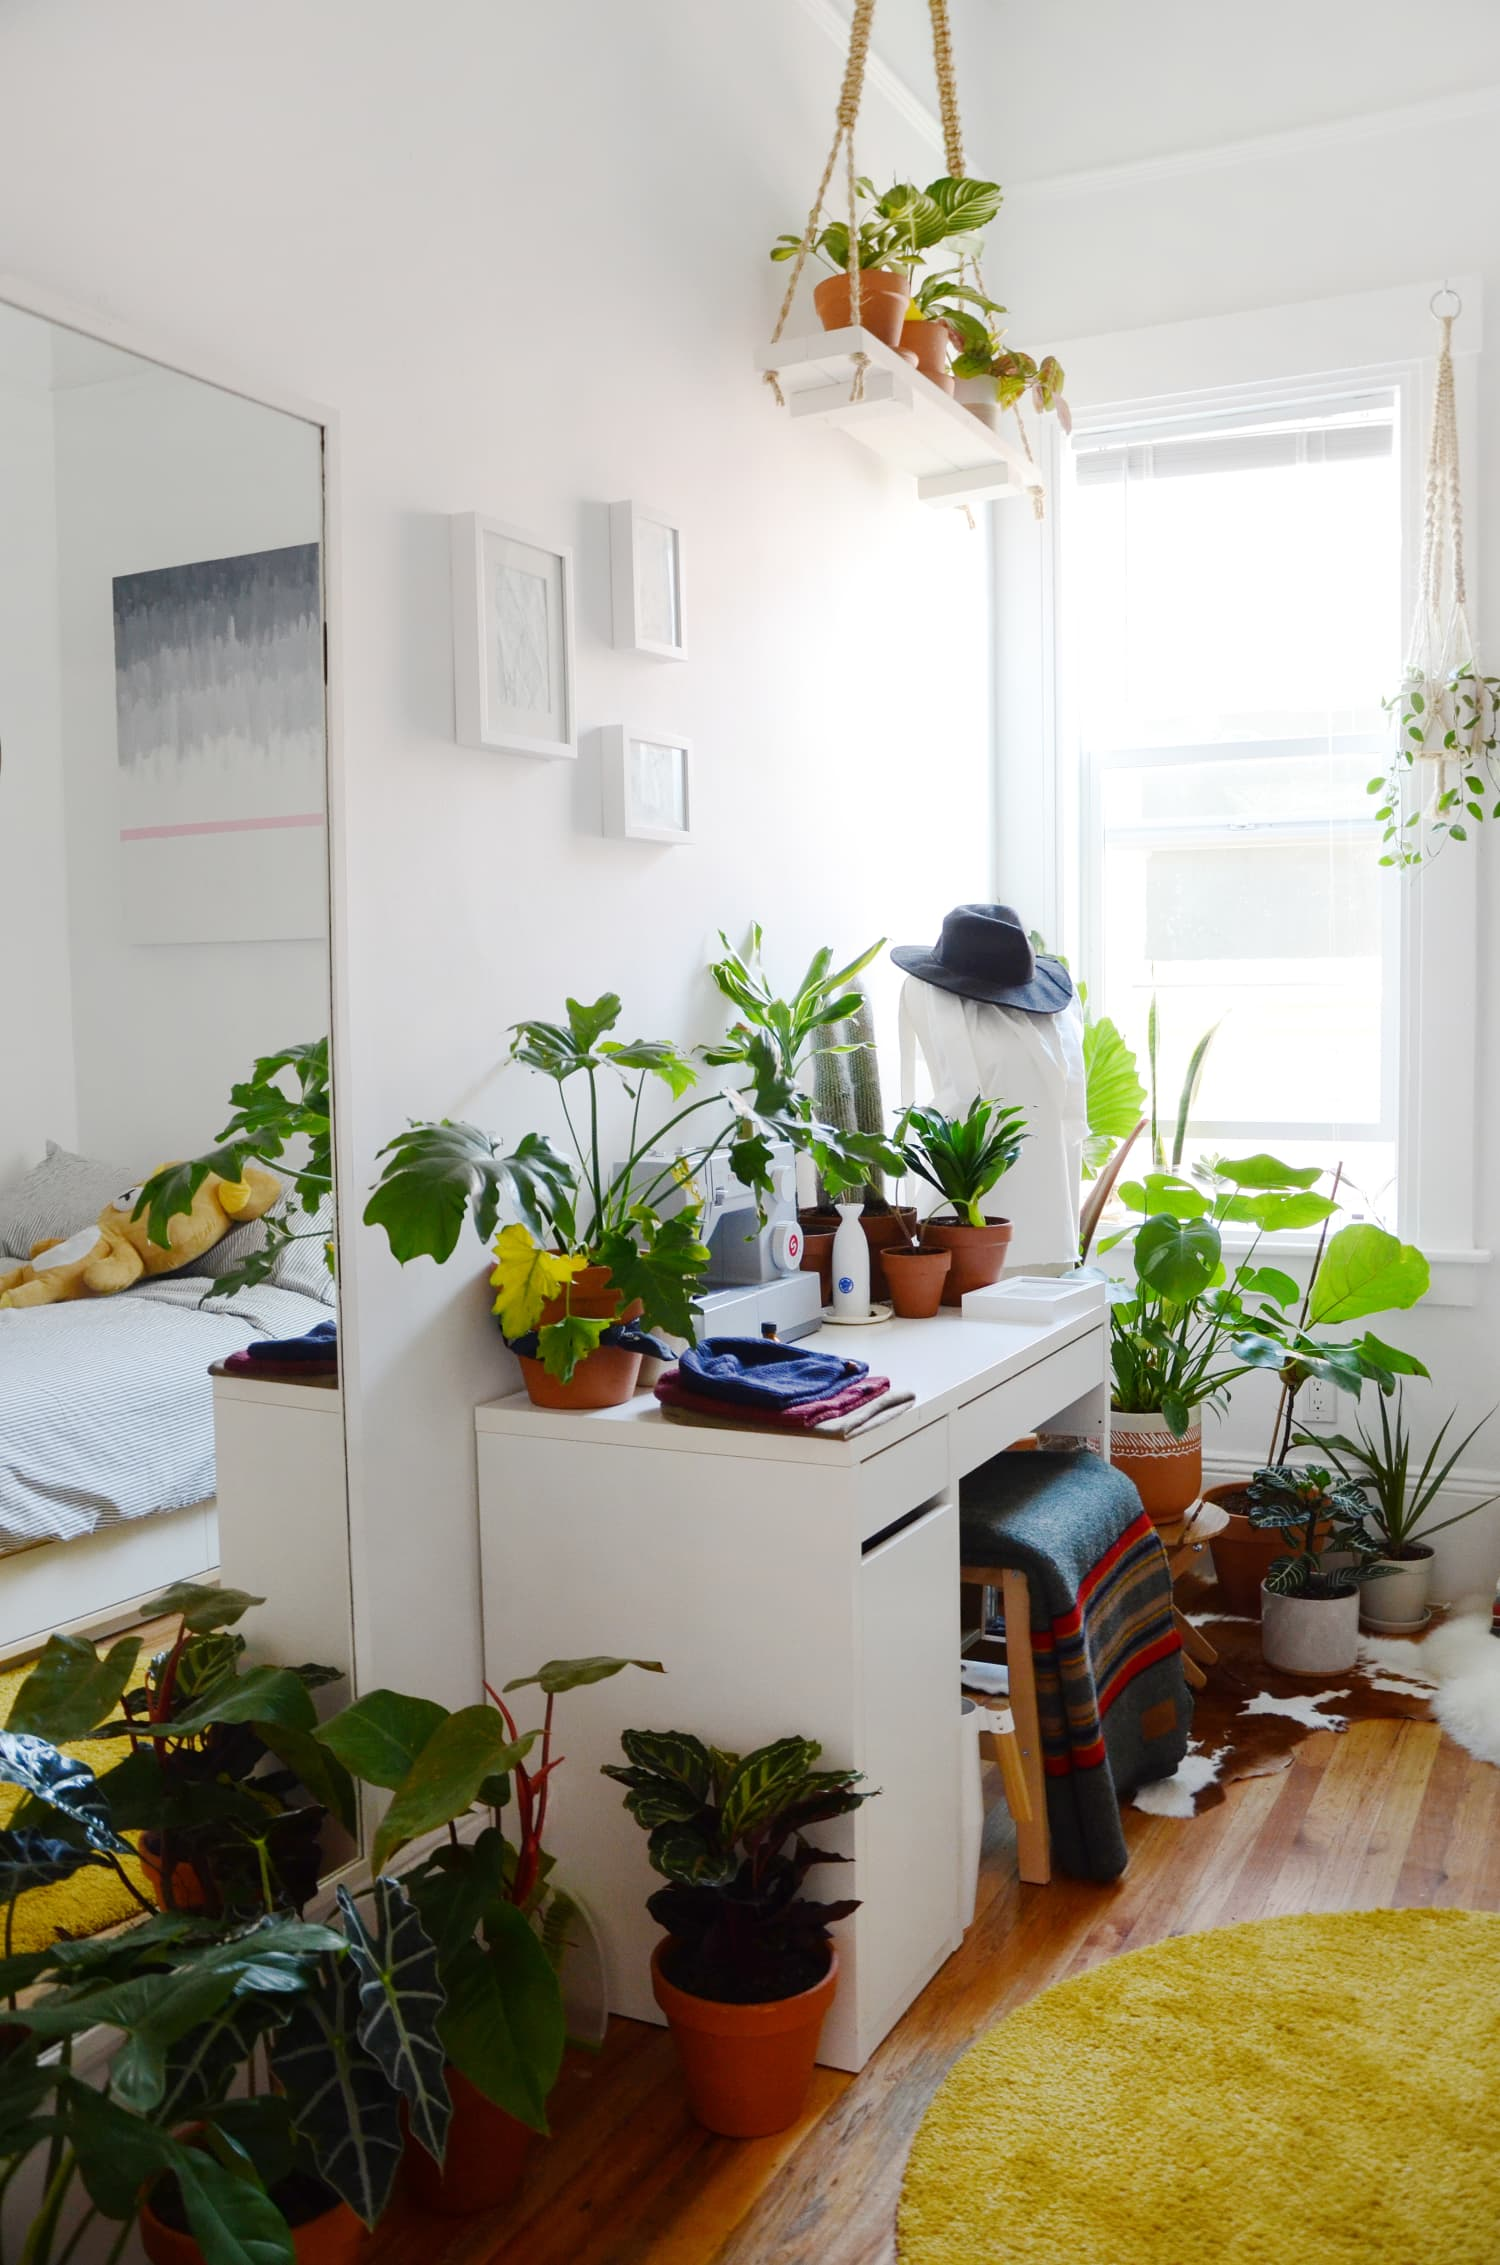 7 Easier Under-the-Radar Alternatives to the Most Popular Yet Finicky Houseplants